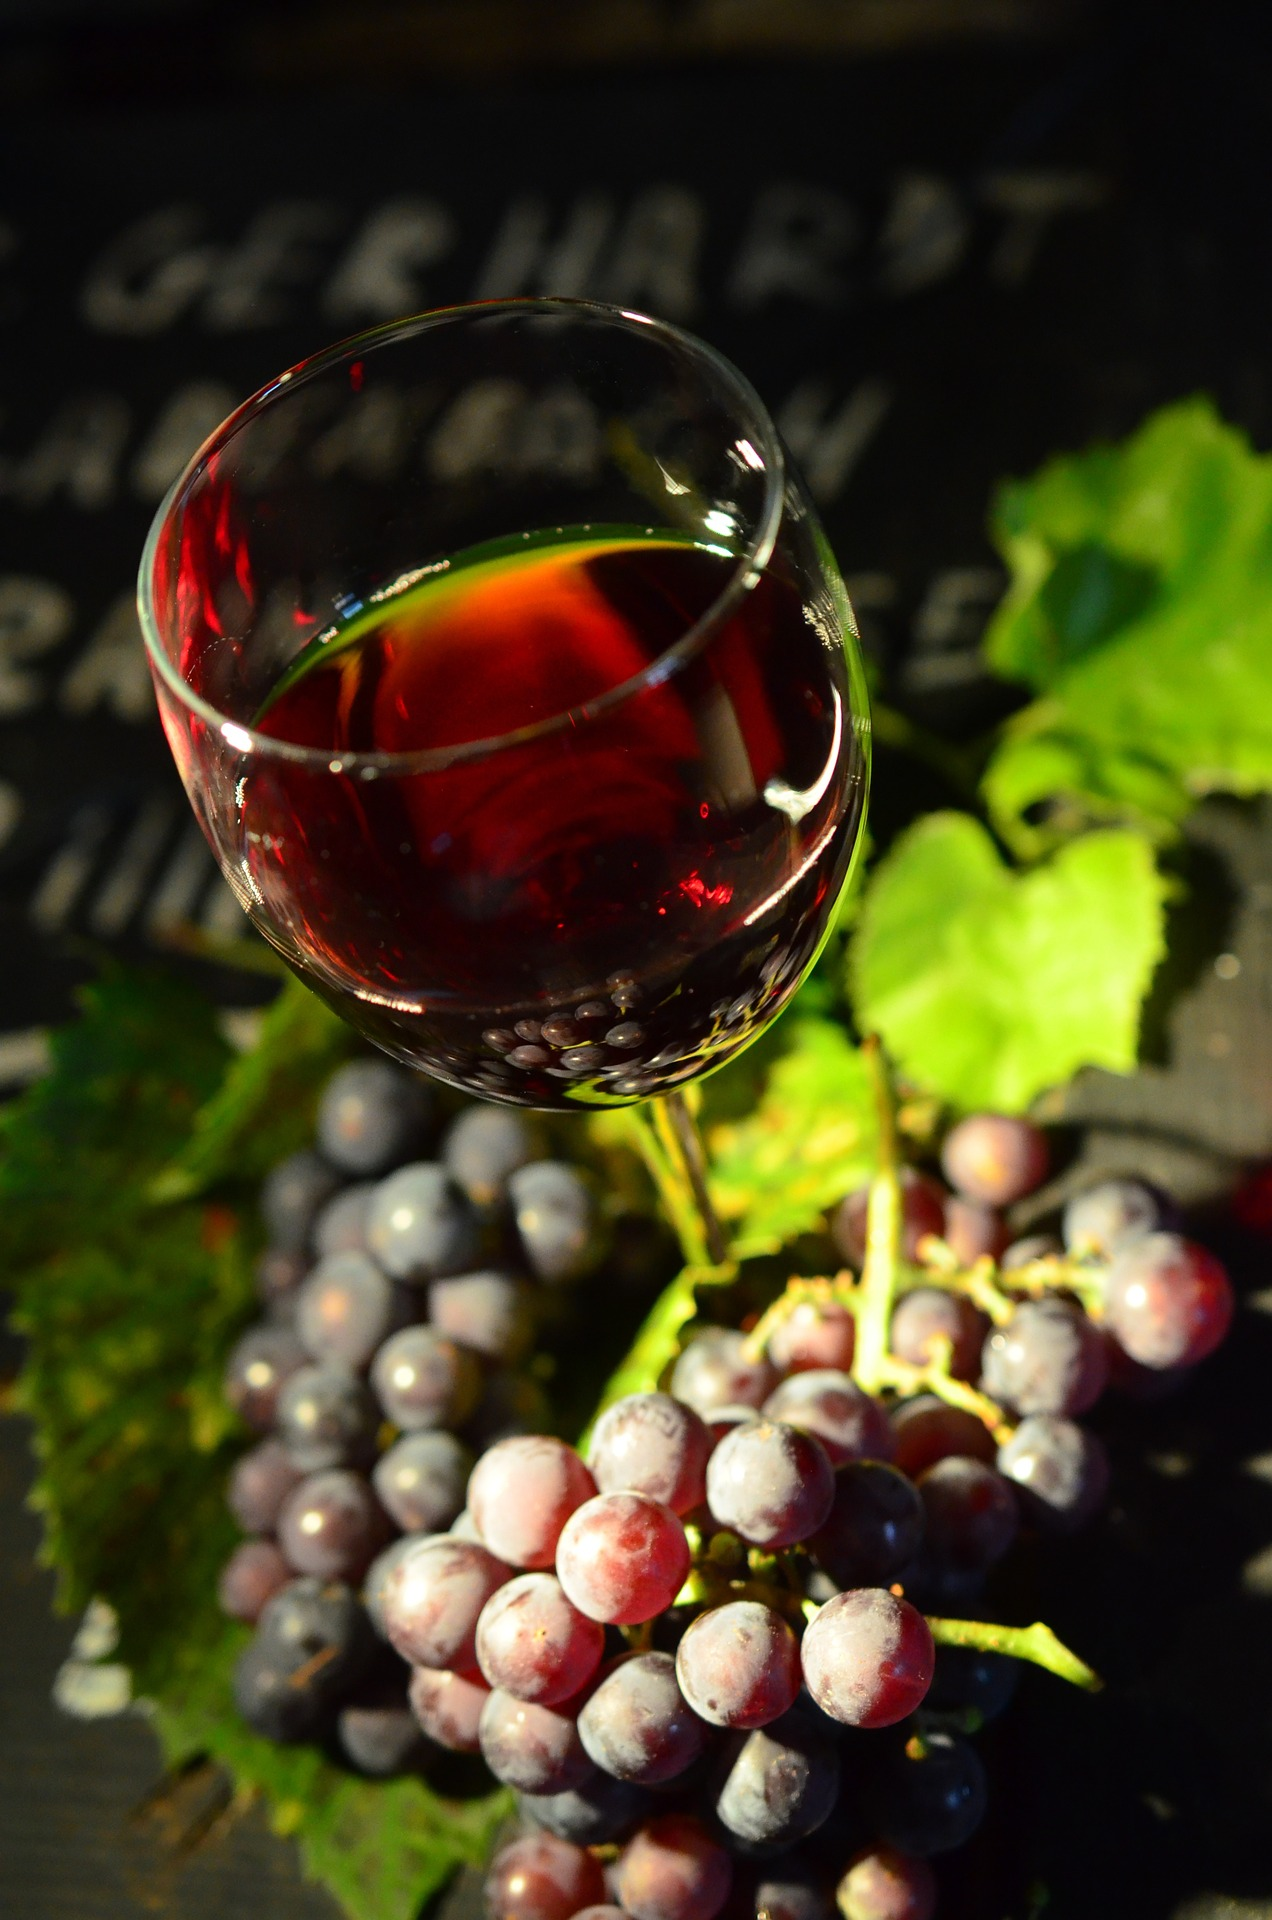 wine-glass-951312_1920.jpg